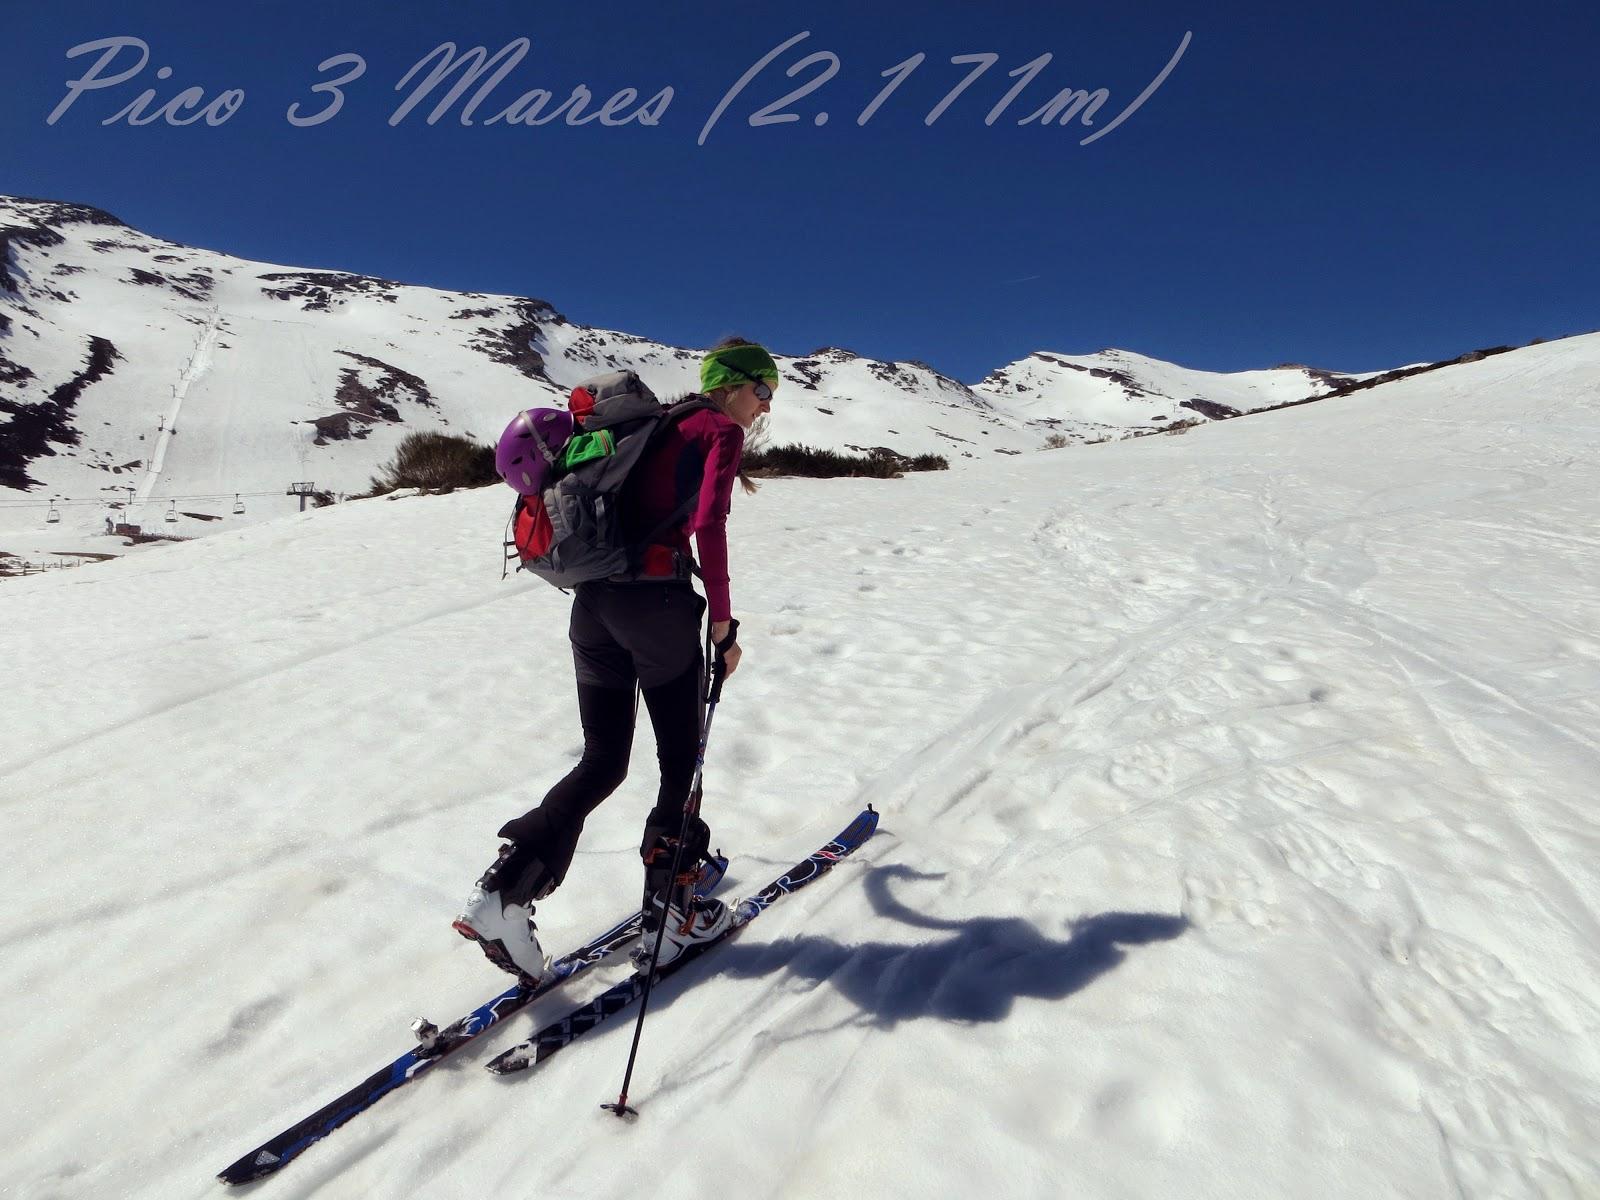 http://sugandillak.blogspot.com.es/2015/04/pico-3-mares-alto-campoo.html